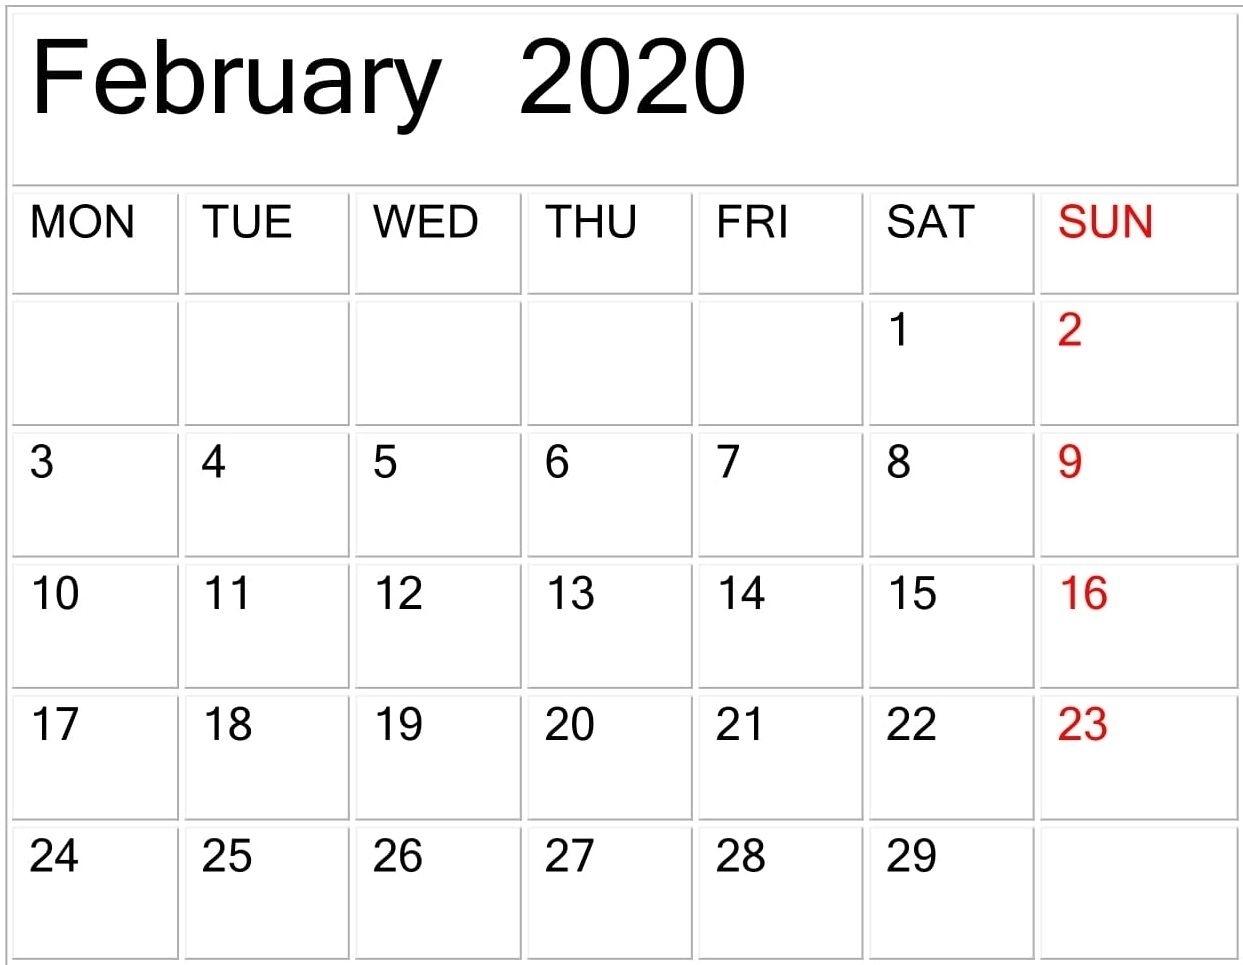 Free Printable Calendar Large Print In 2020 | Printable with Free Printable 2020 Calendars Large Numbers